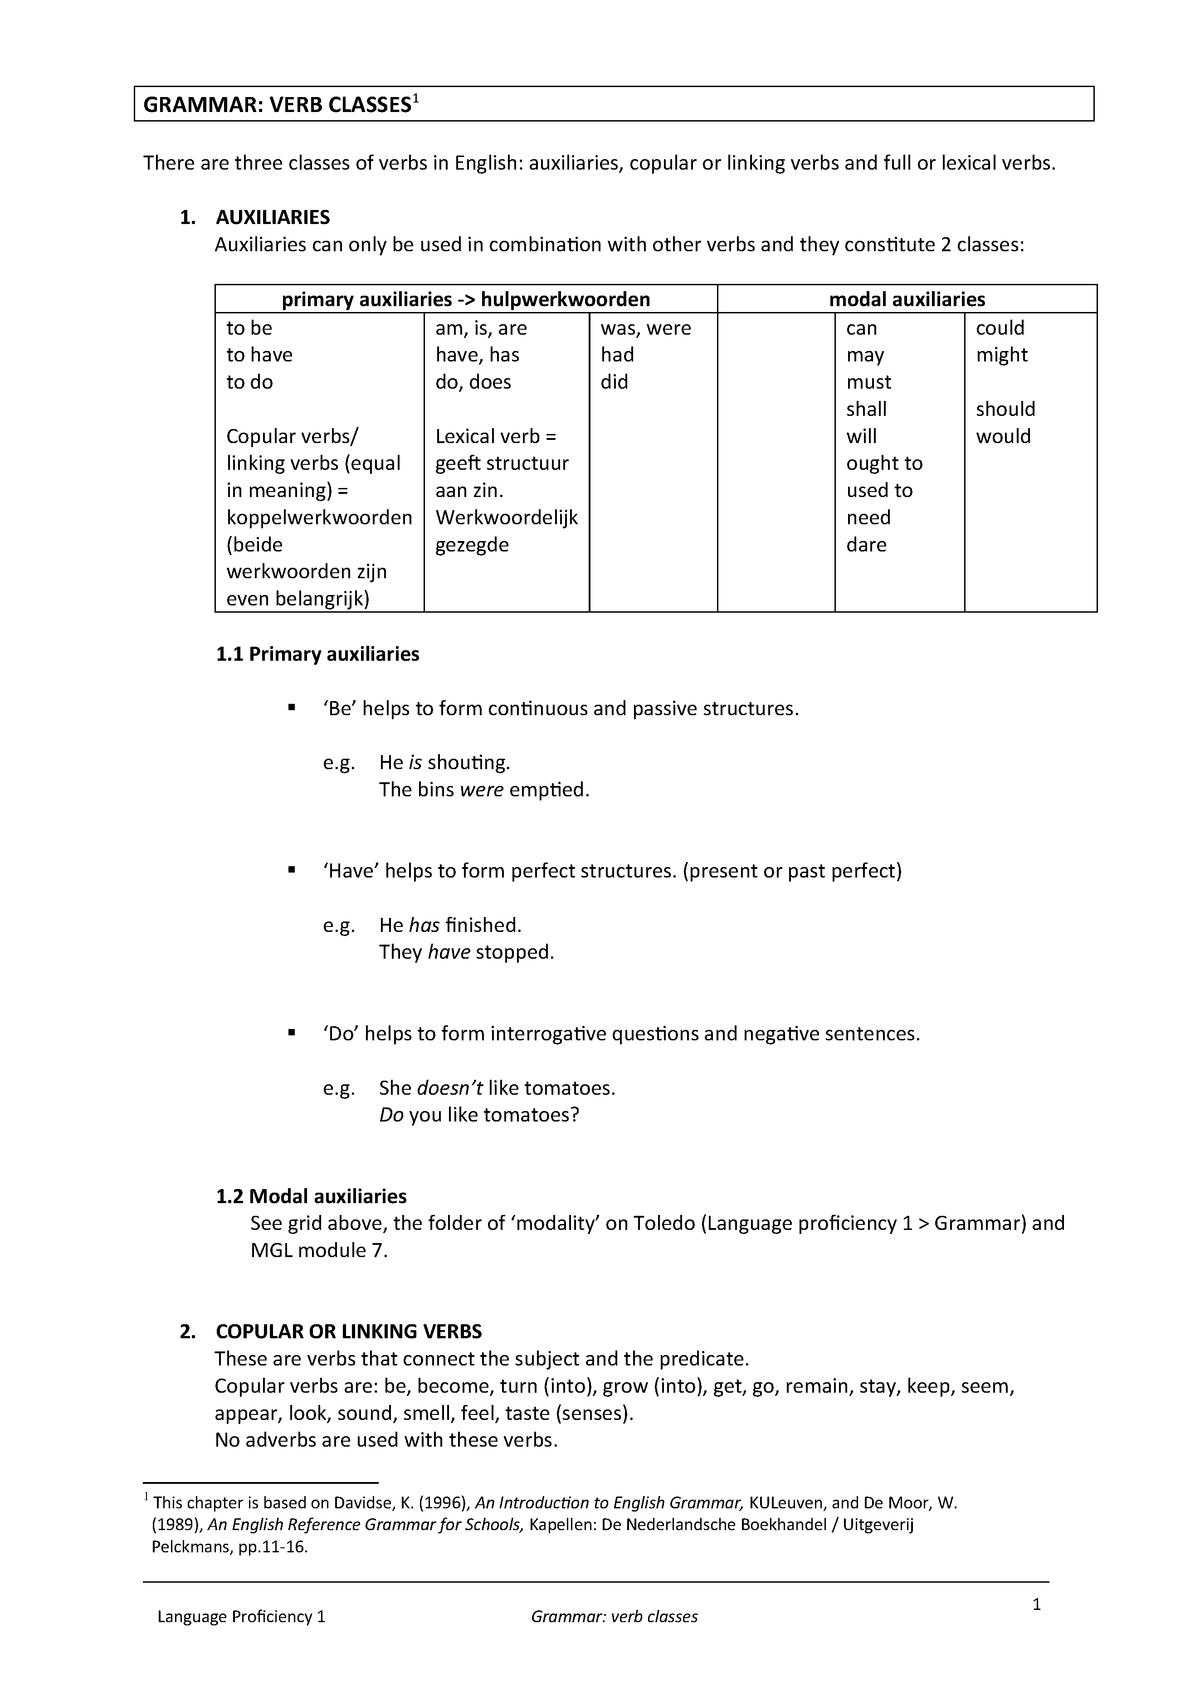 Verbclasses - Extra handouts - Engels 1 YB0211 - Thomas More